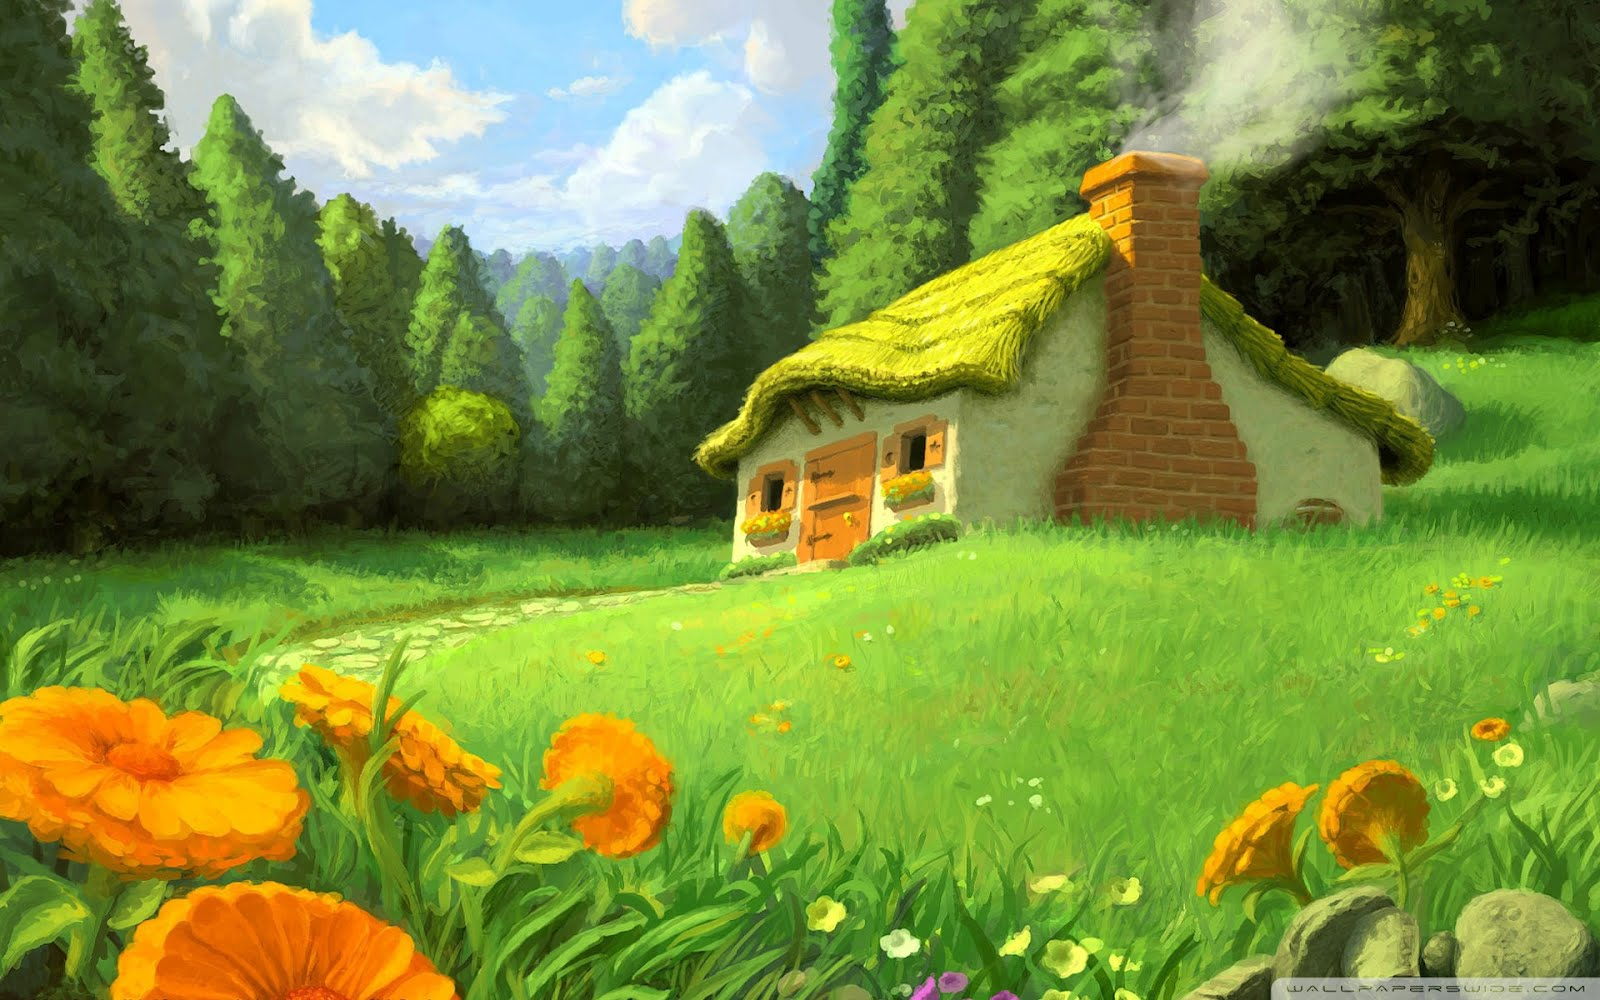 http://1.bp.blogspot.com/-YPBCoQLt_Ts/TzfKqo5d1AI/AAAAAAAAAOY/DucuAQShmdI/s1600/fantasy_landscape-wallpaper-1920x1200.jpg